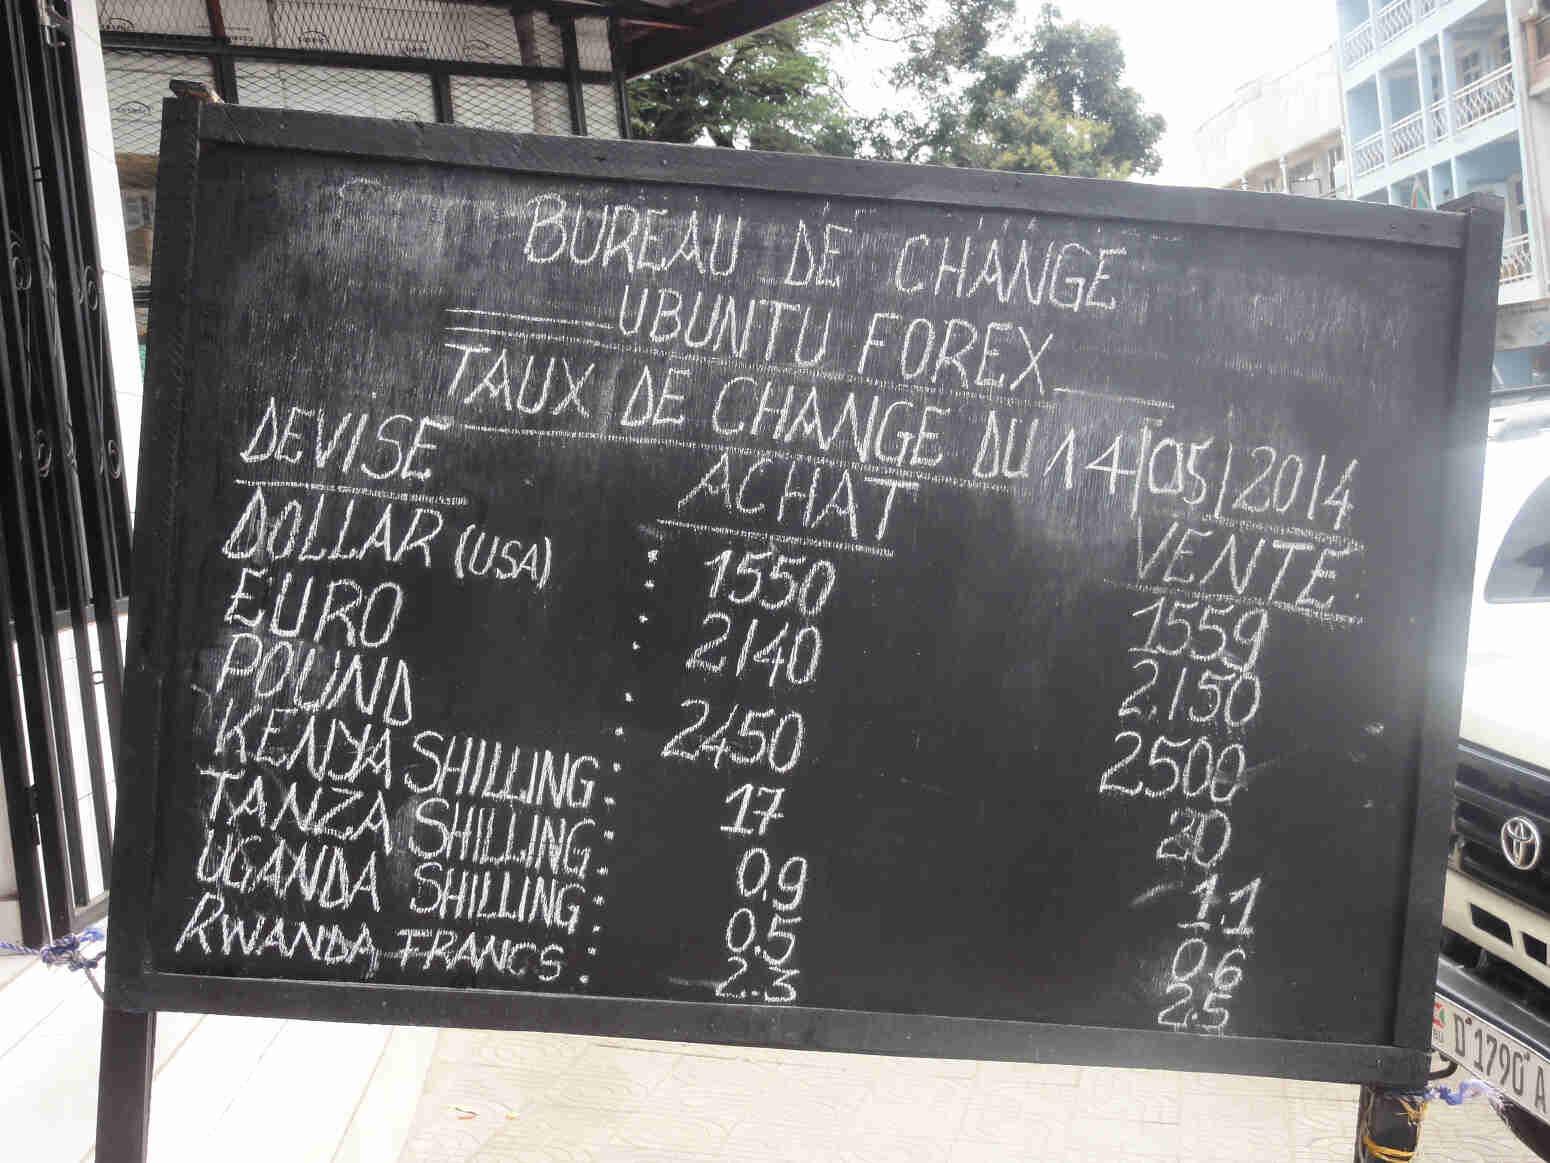 Dog food and croissants a glimpse of life in bujumbura eca international - Bureau de change marbeuf ...